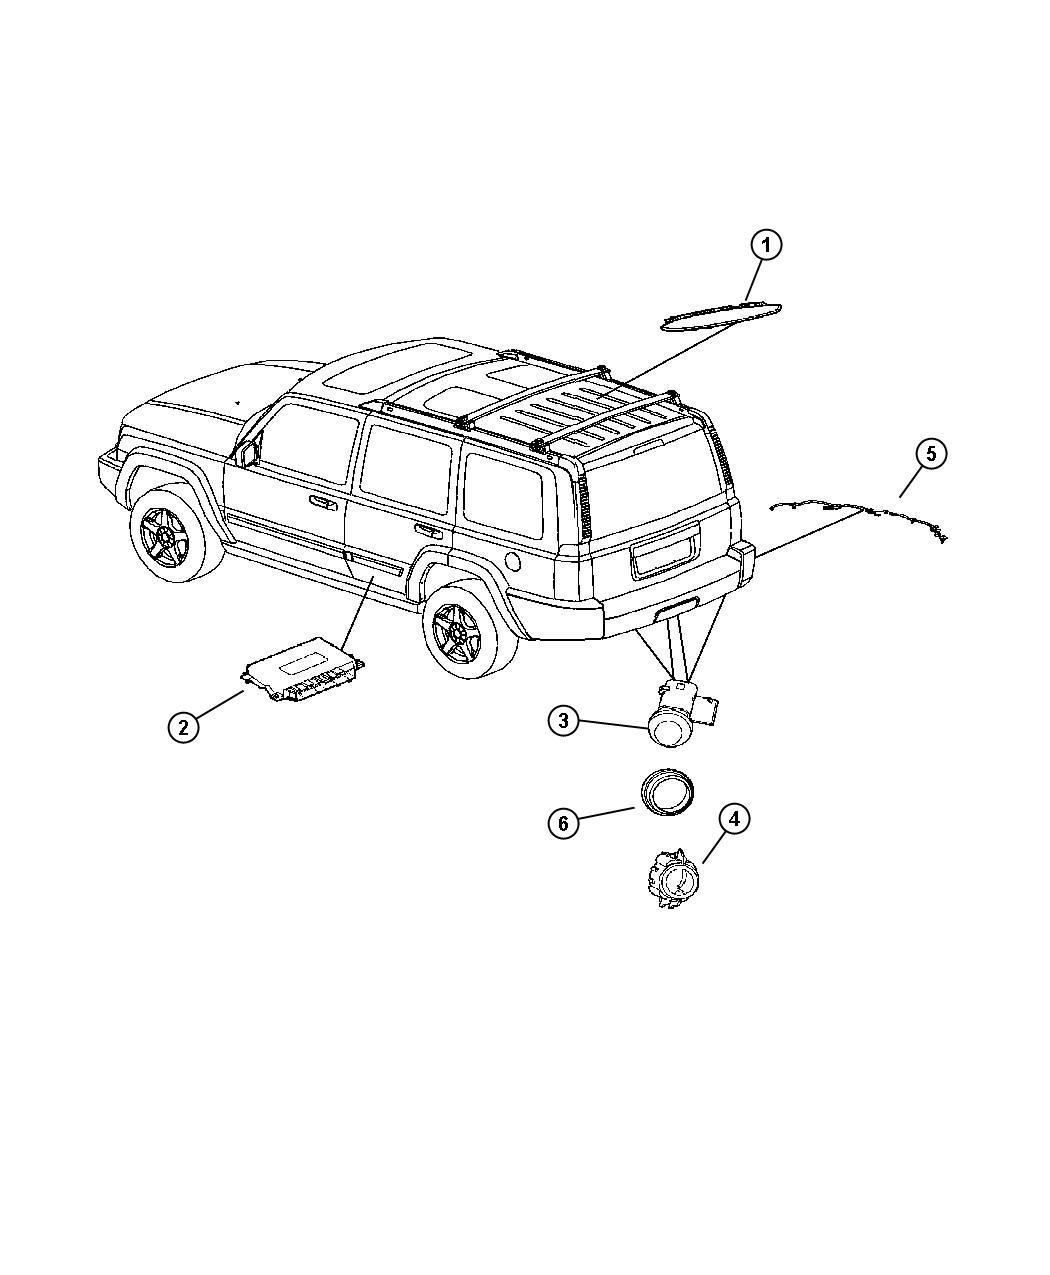 Jeep Commander Harness, wiring. Rear fascia, sensor wiring